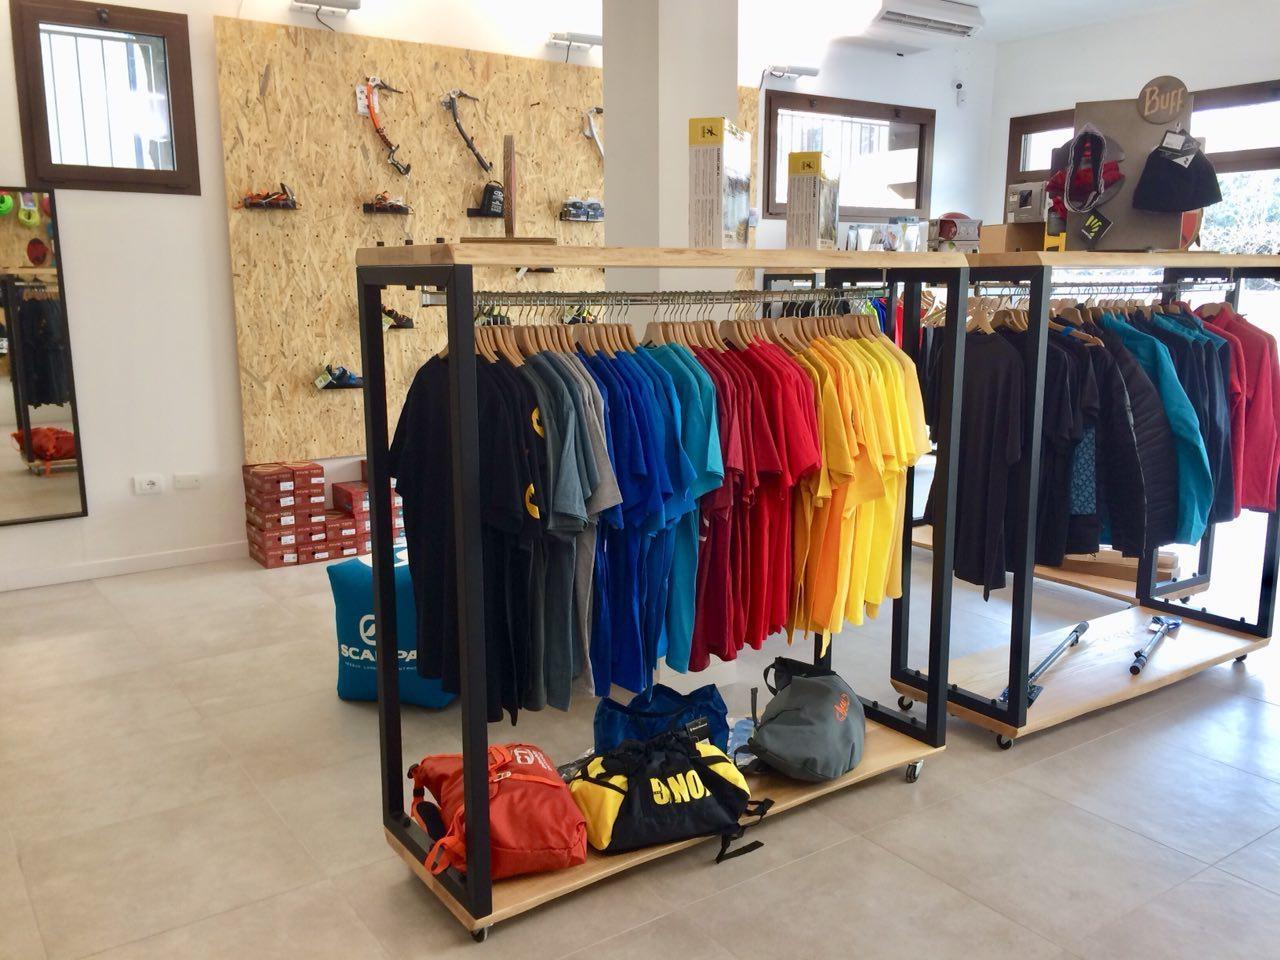 Negozio arrampicata a Padova: Oliunìd Shop Padova